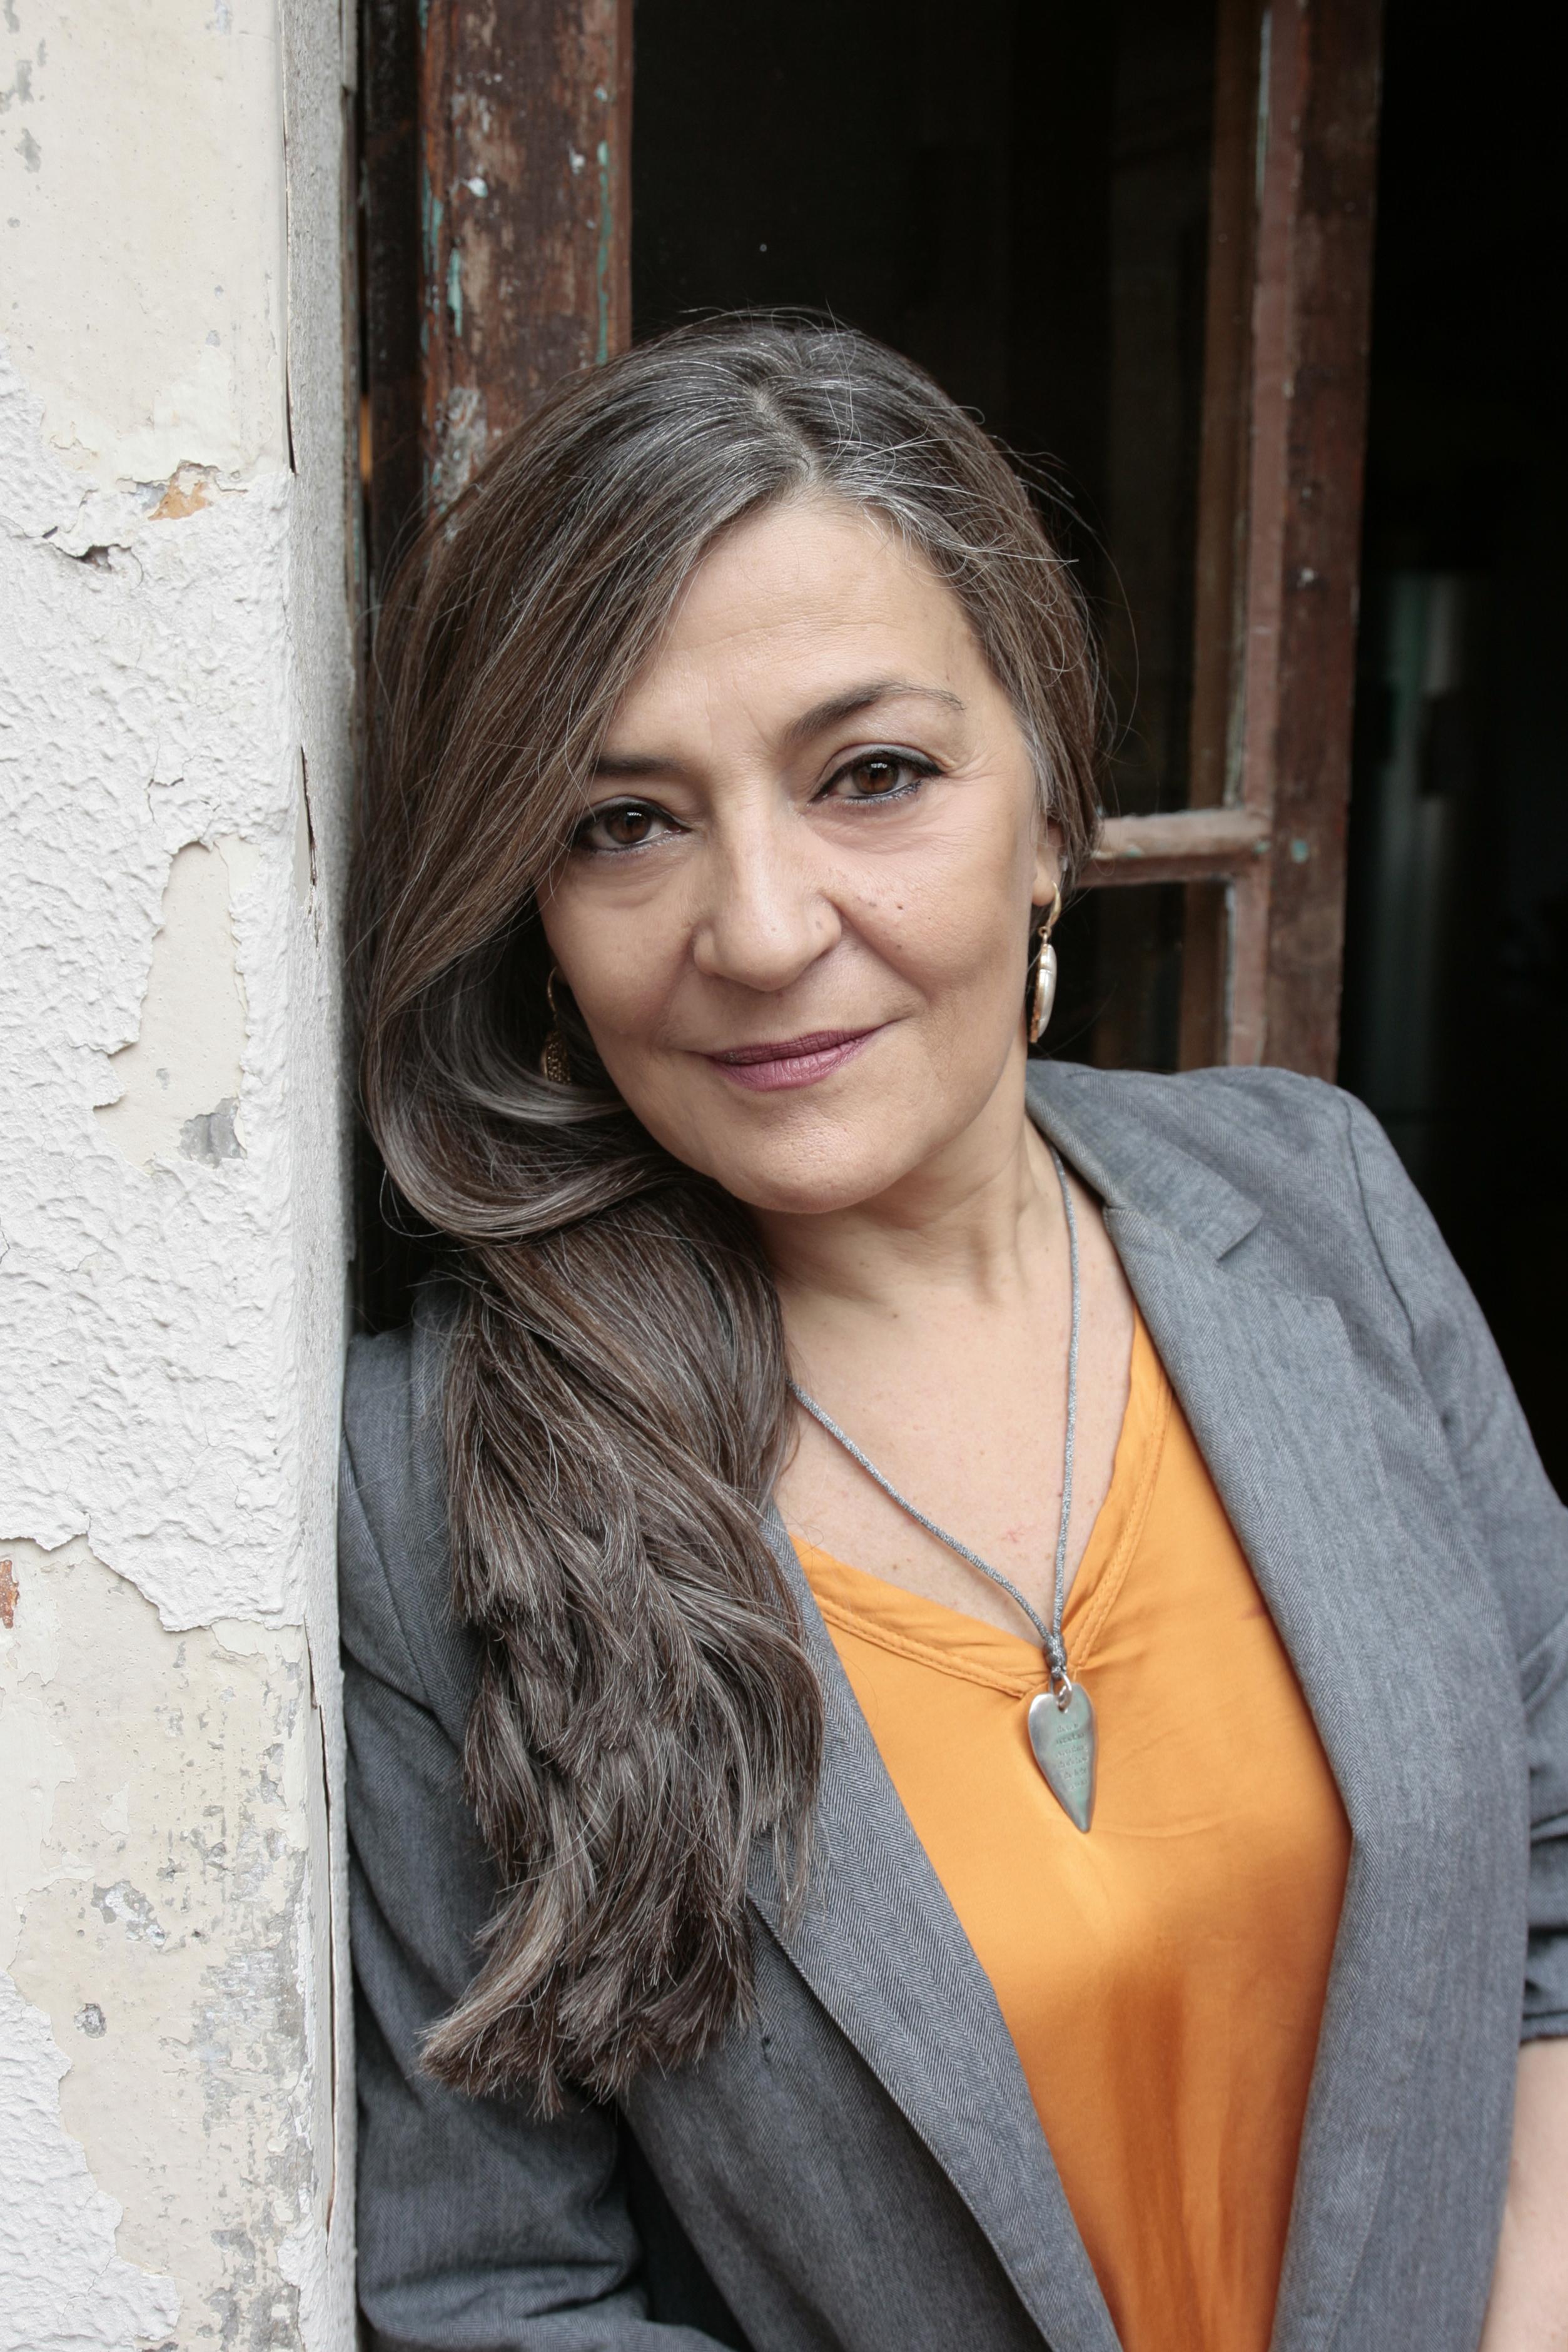 Olga Merino Lopez